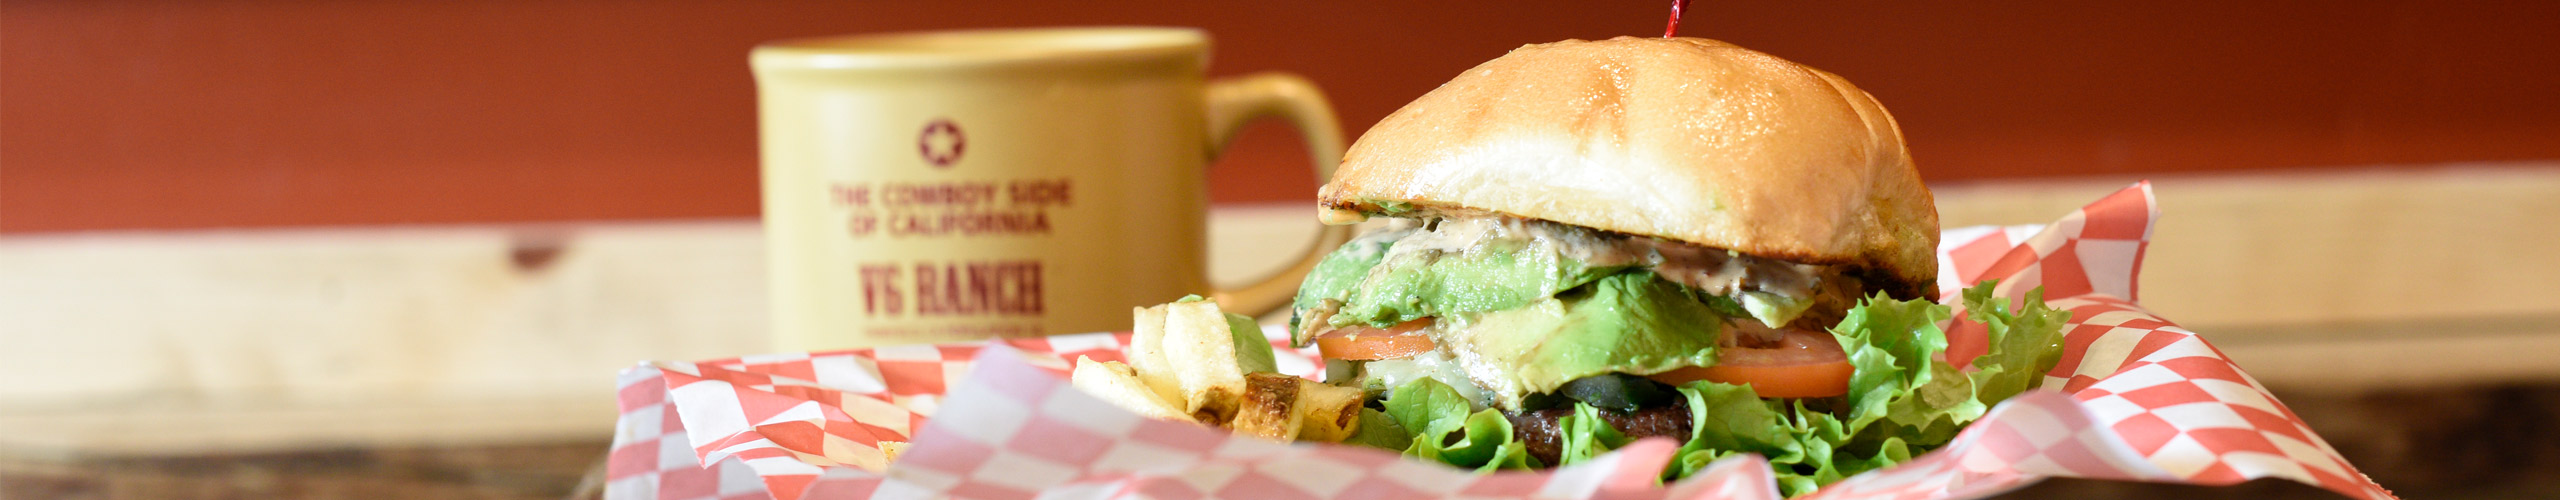 Parkfield_Cafe_Shakin_Burger